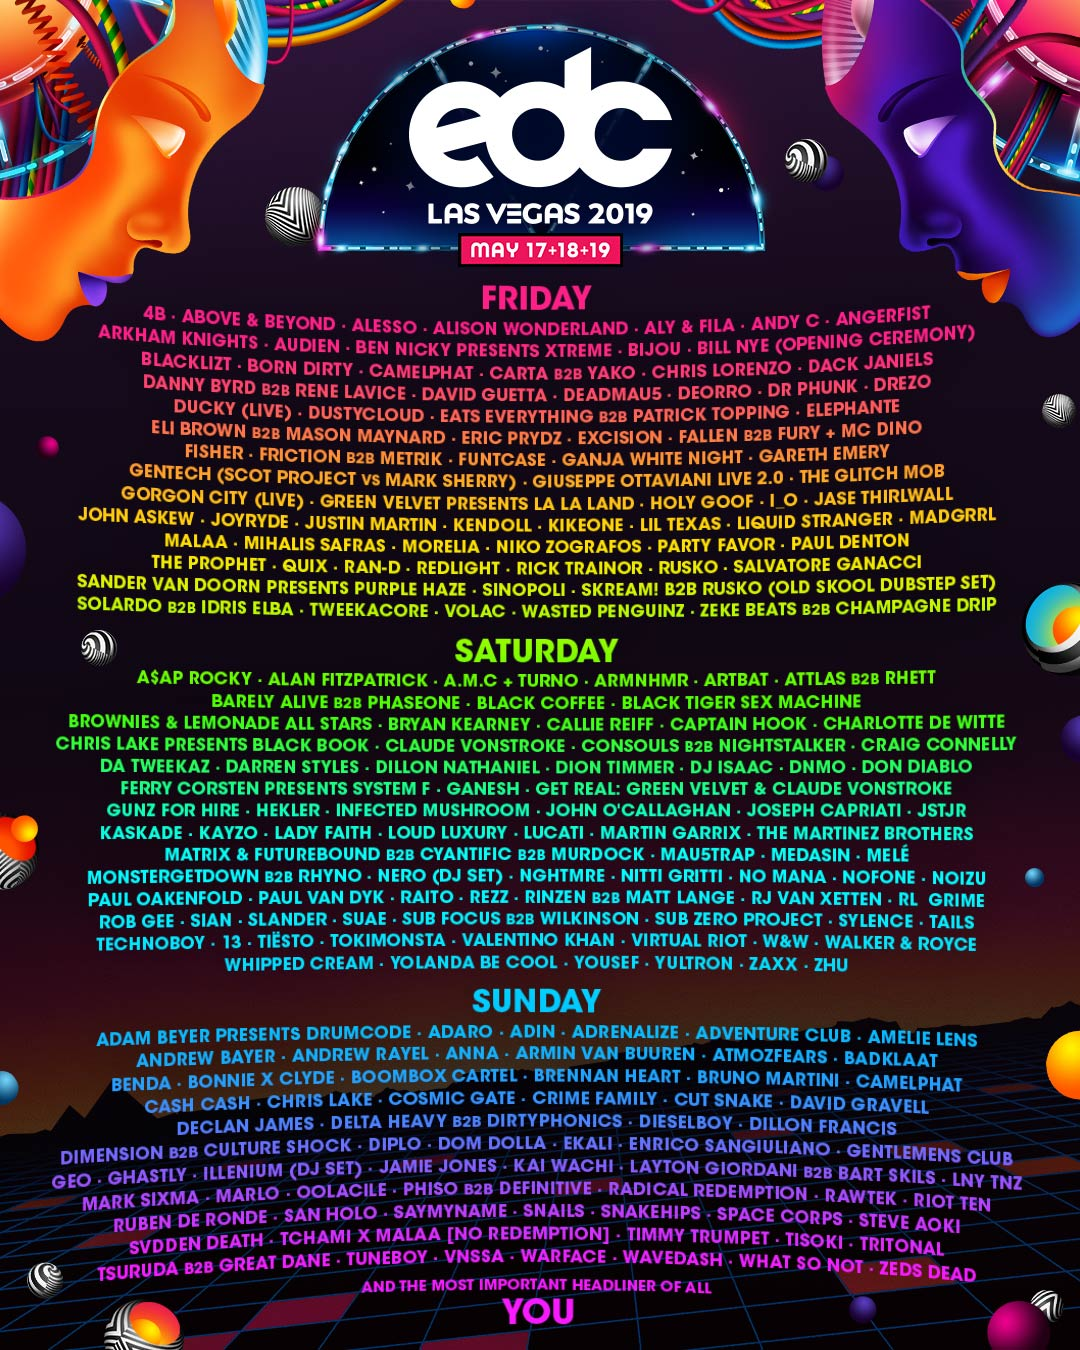 Official Line-Up for EDC - Las Vegas 2019